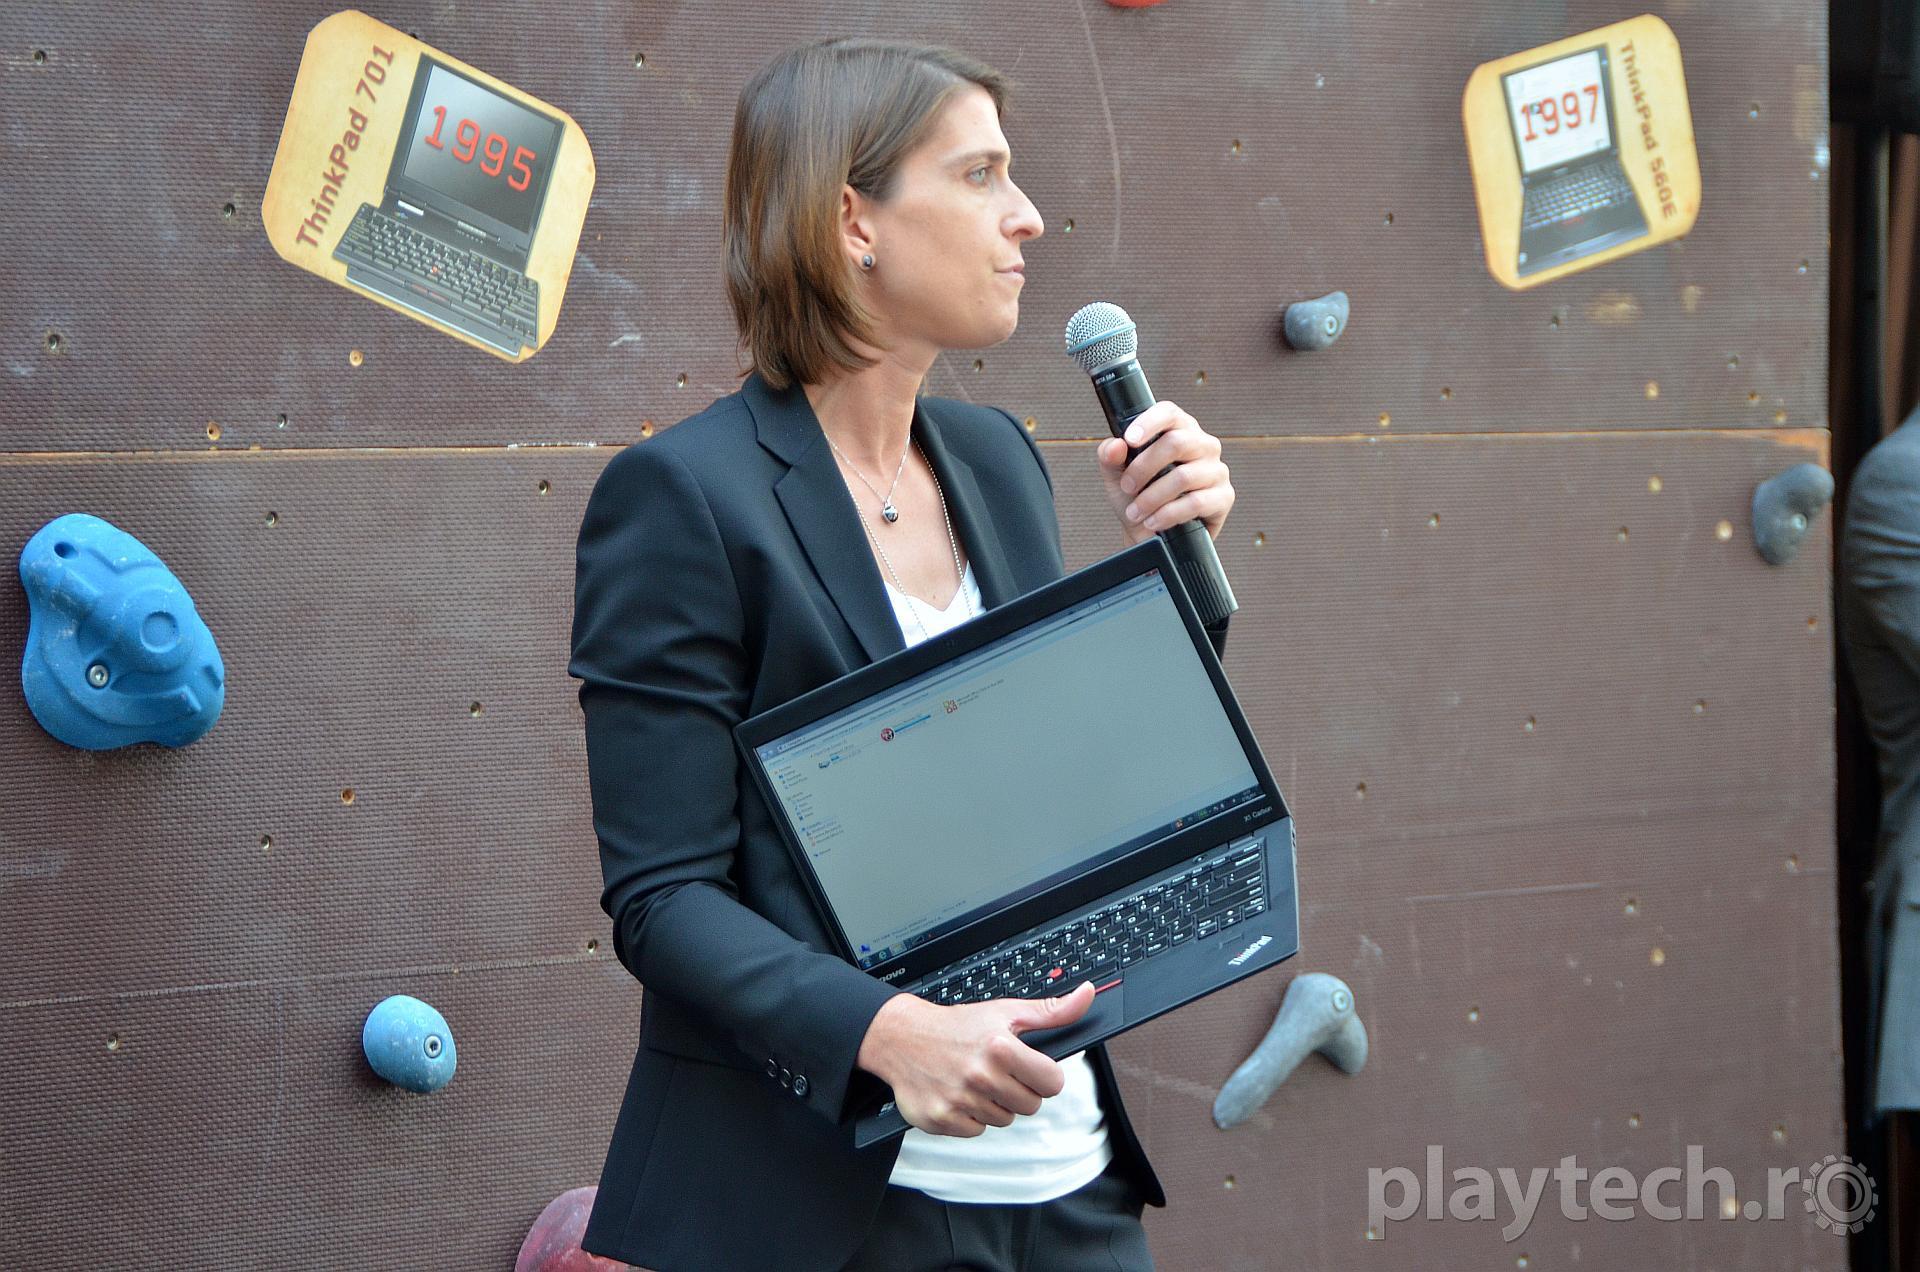 Lenovo lanseaza noul ultrabook ThinkPad X1 Carbon